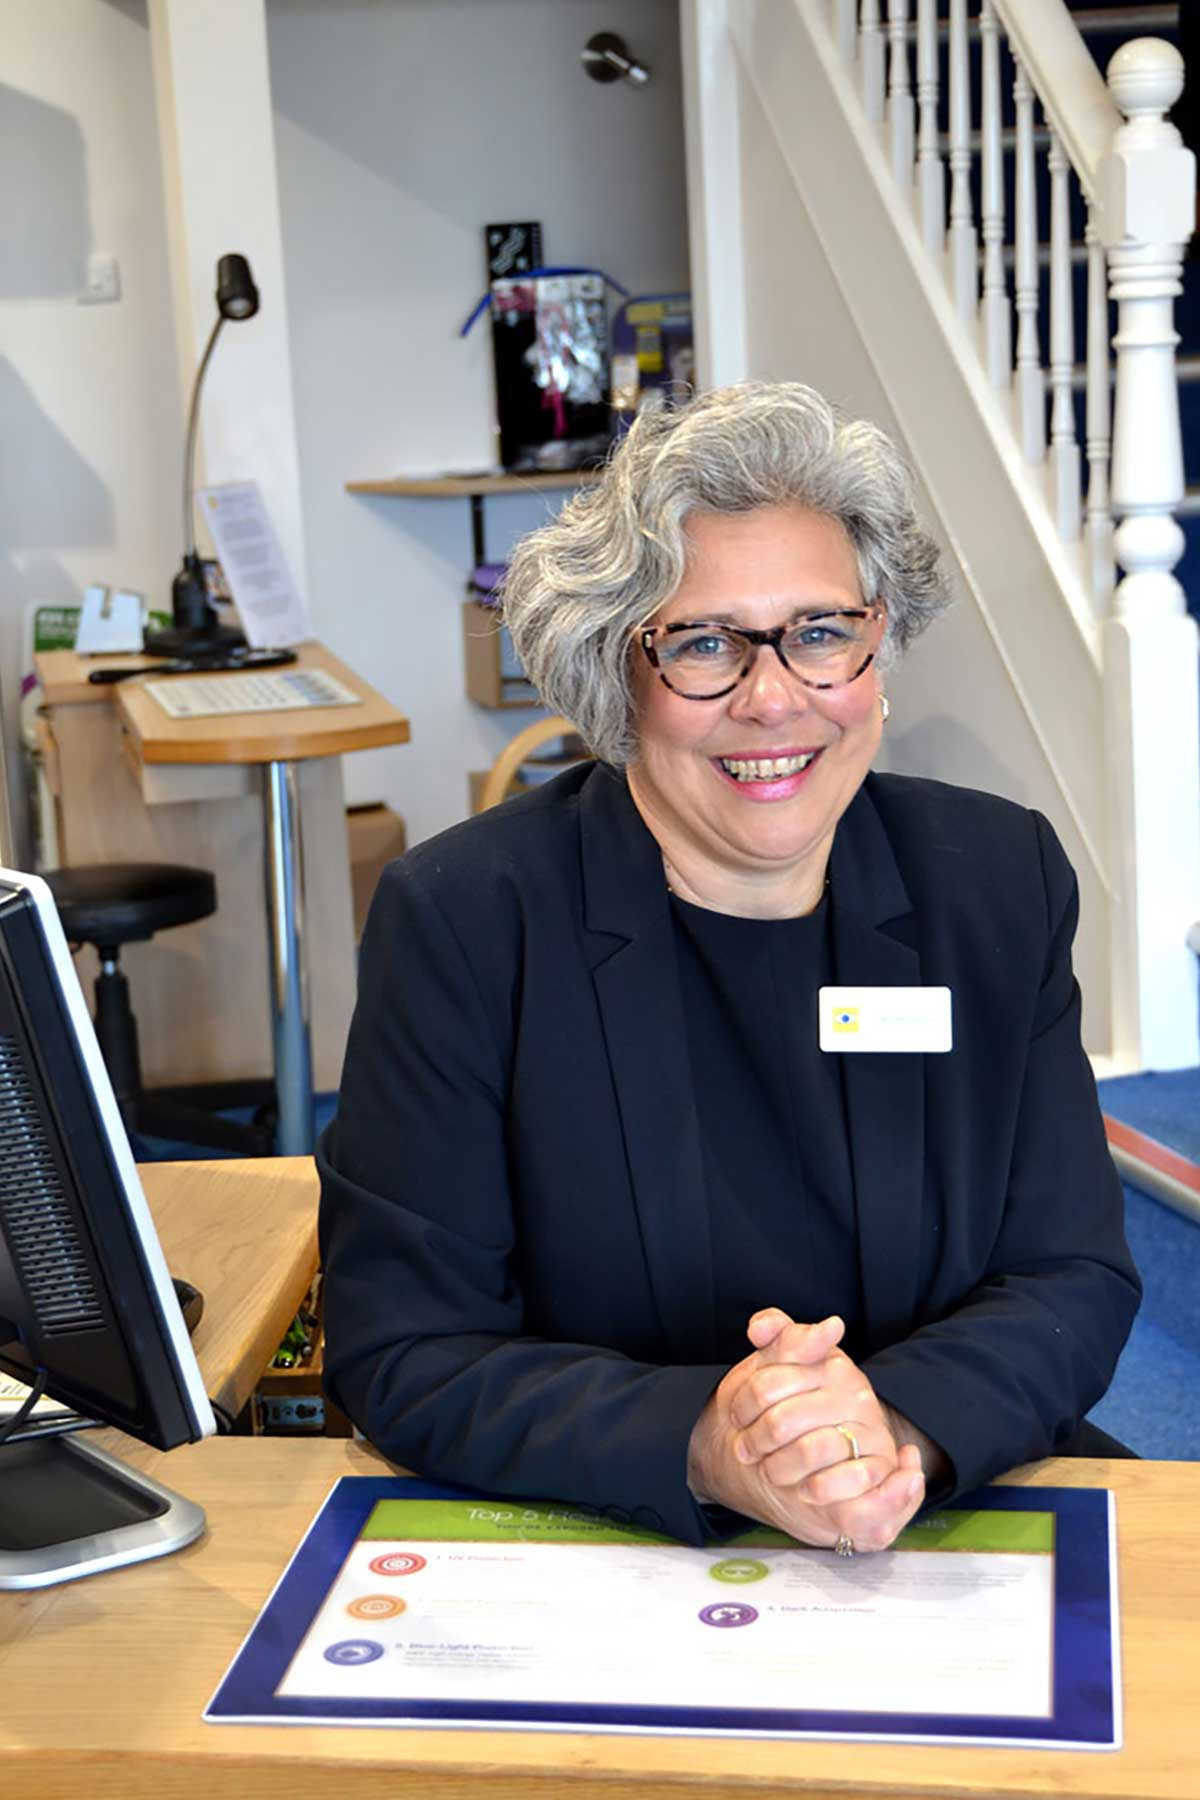 Anthea Goddard FBDO, Prof Cert LV, SMC (Tech), Dispensing Optician